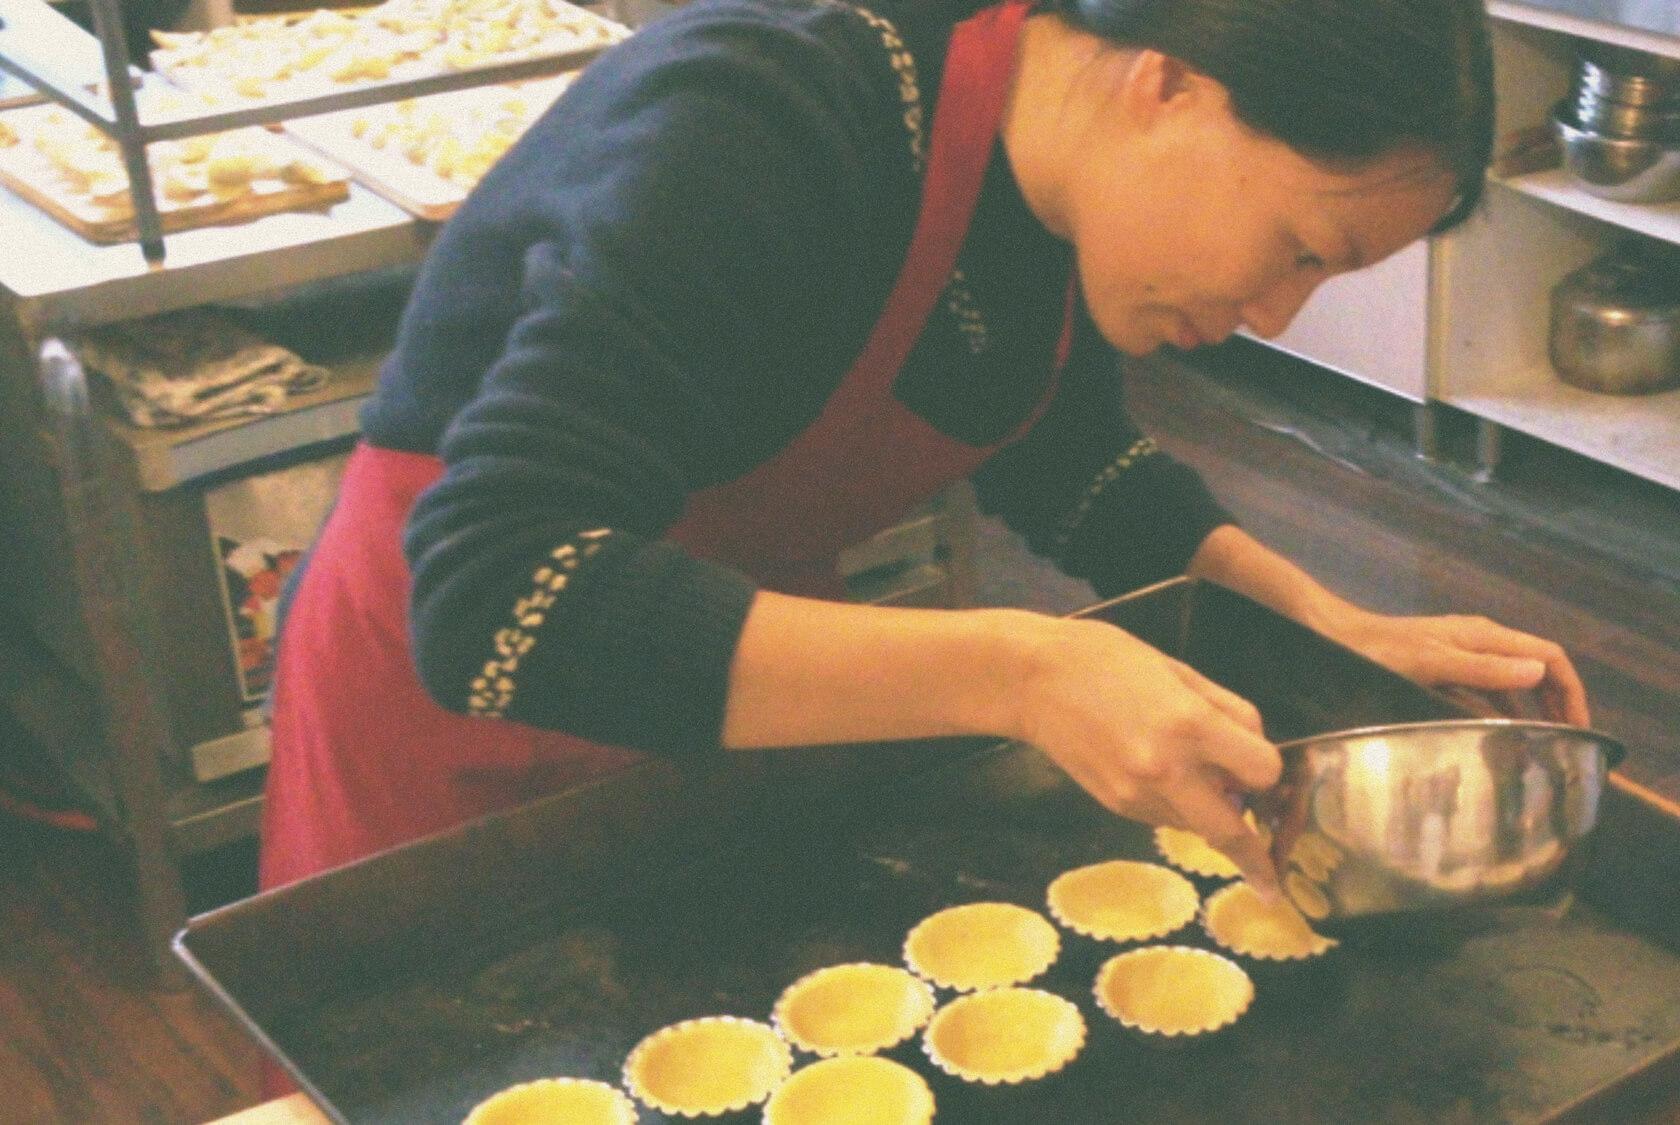 Chunyi Zhou - Good Food / Traveling / Focus